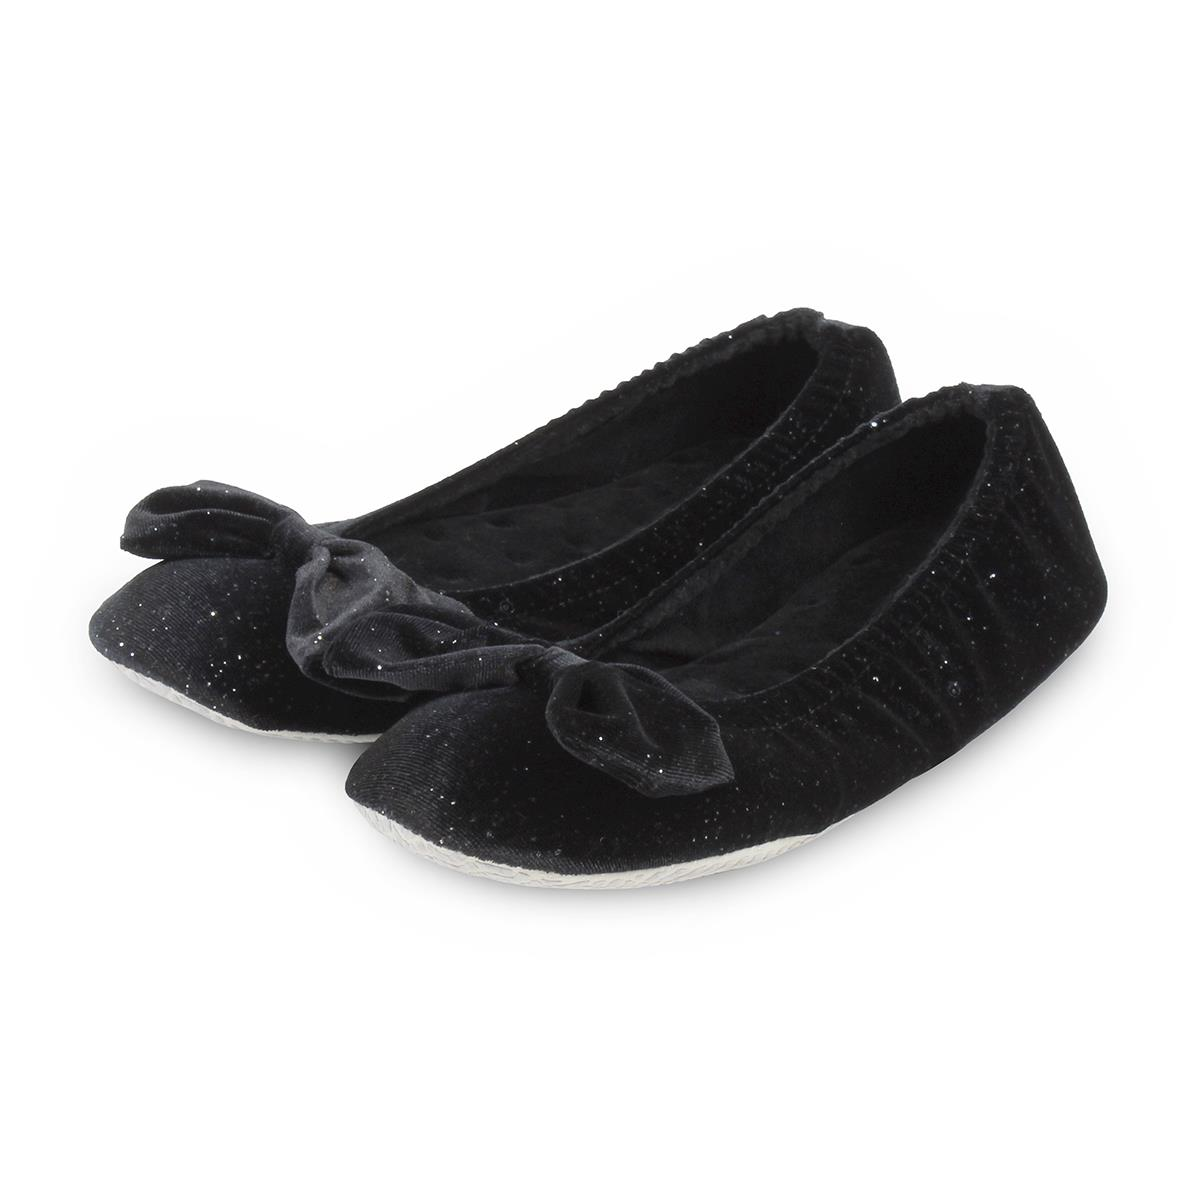 aa70038e3eb Isotoner Ladies Sparkle Velour Big Bow Ballet Slippers Black